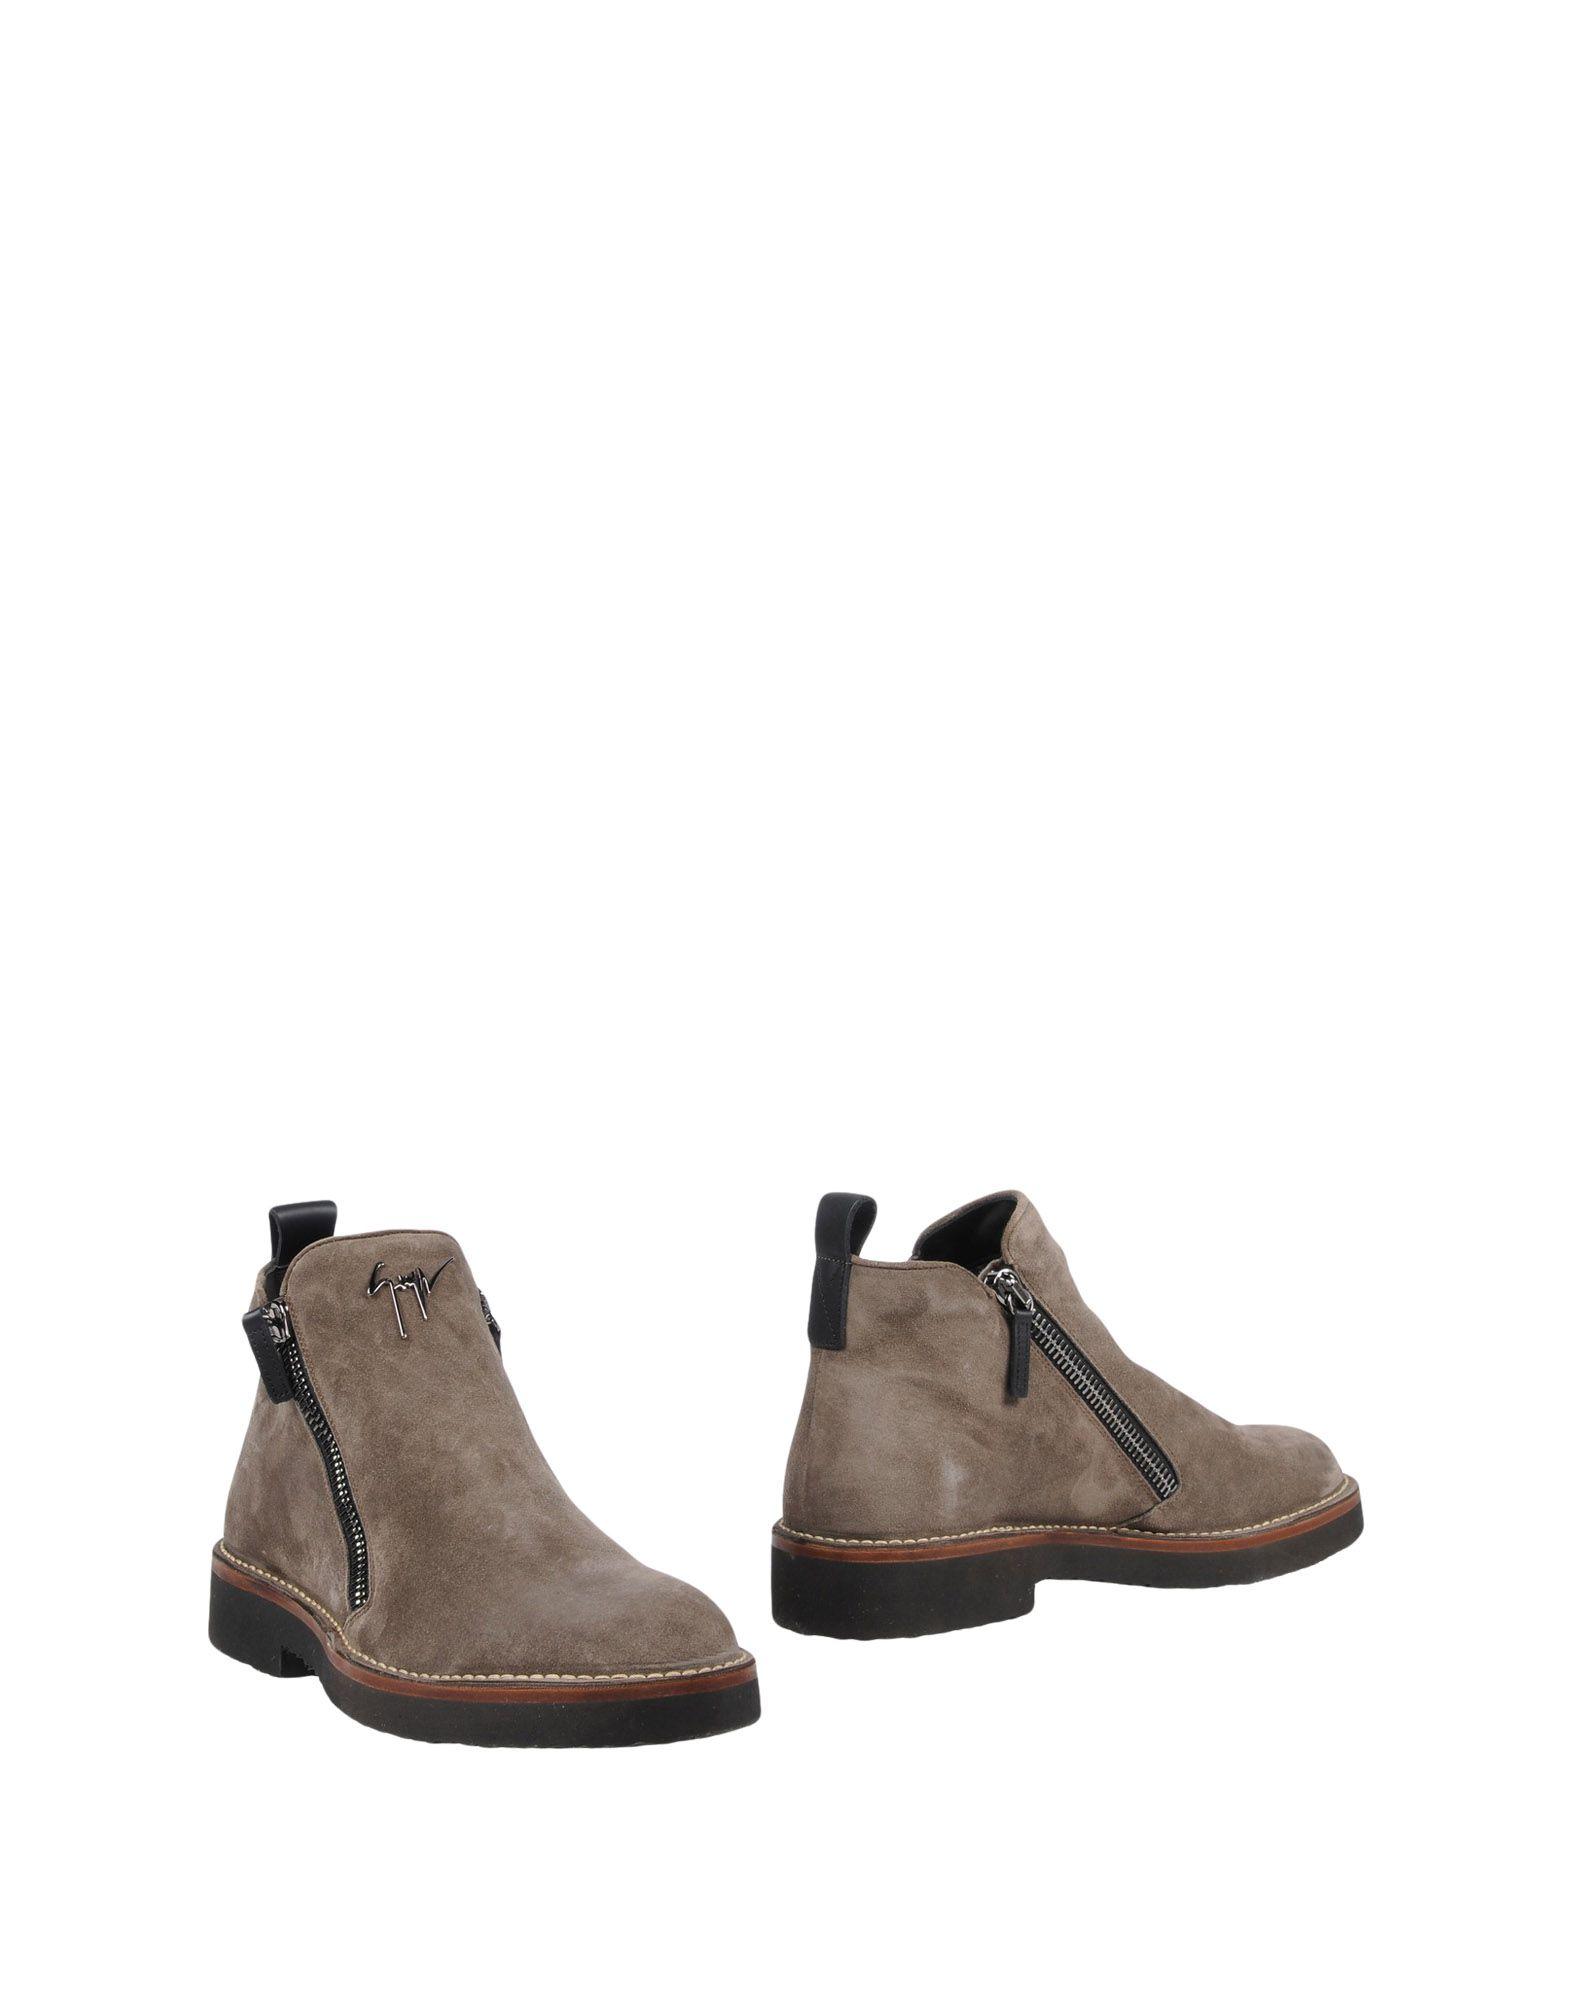 Giuseppe Zanotti Stiefelette Herren  11447197EN Gute Qualität beliebte Schuhe